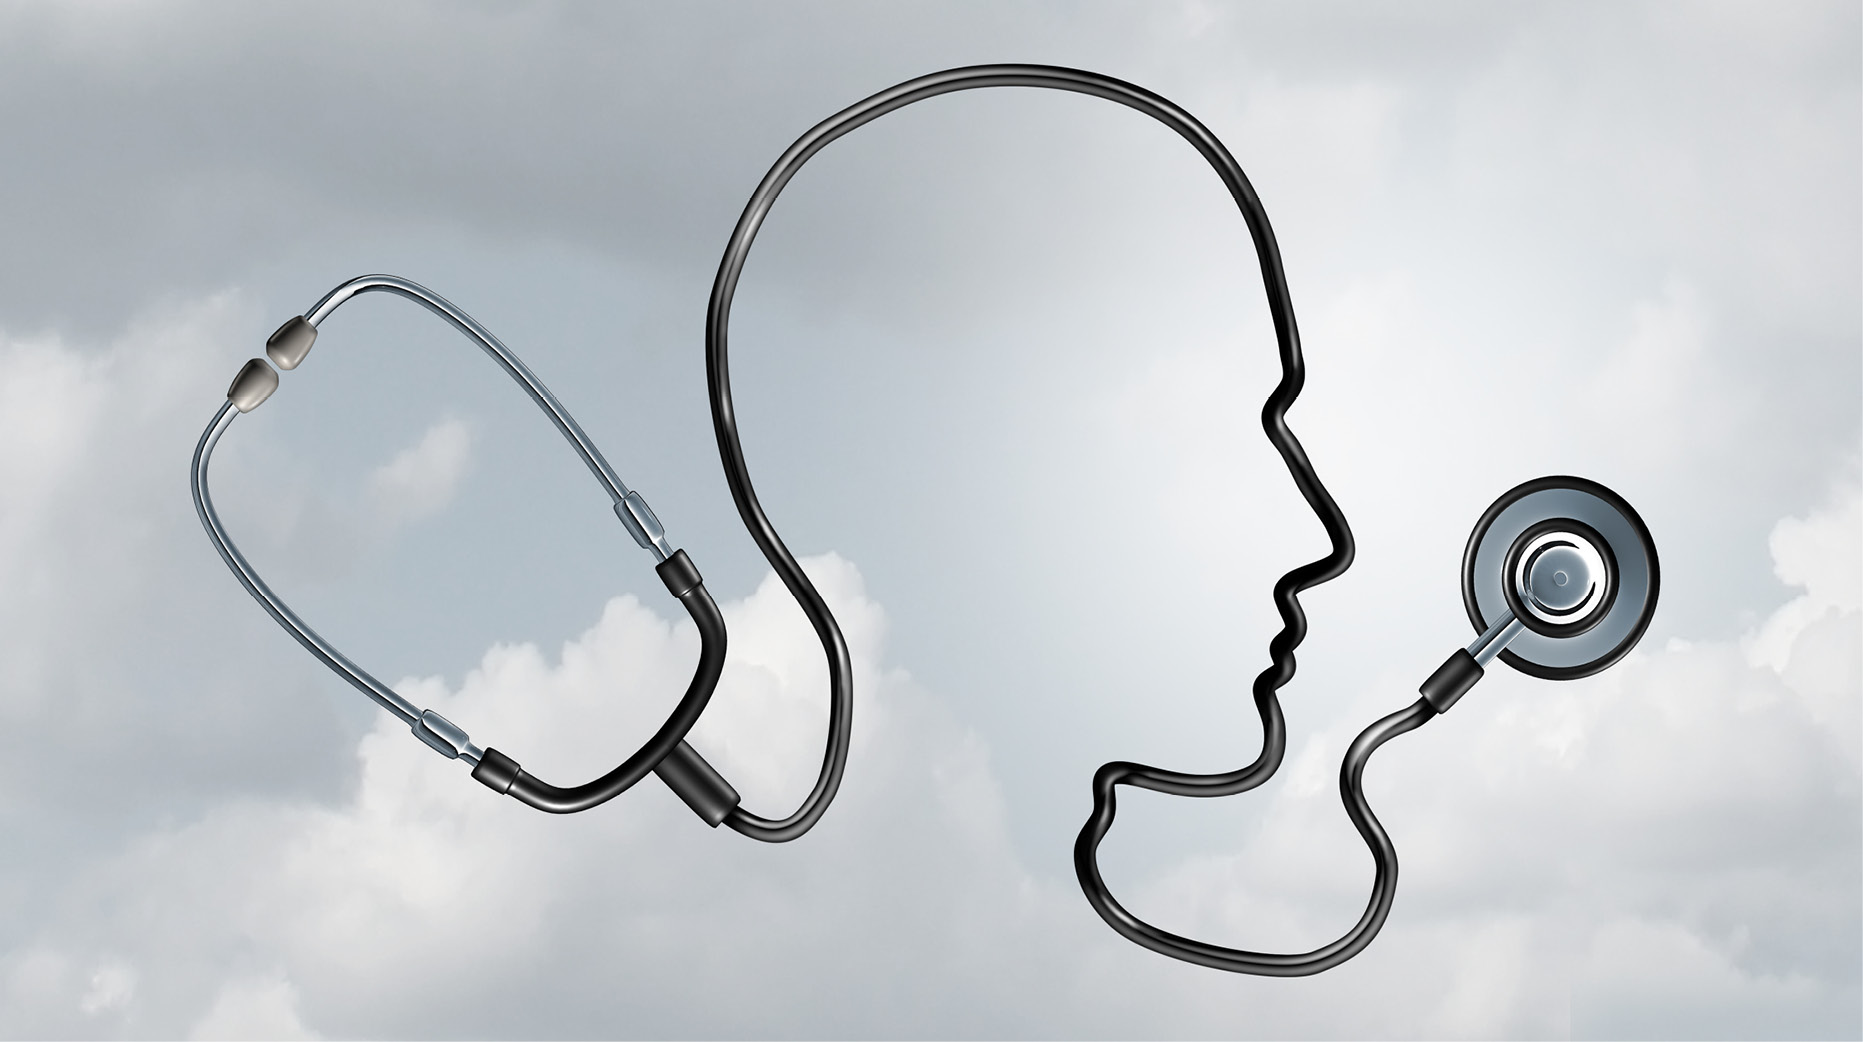 _hero-image-The Funding Crisis of Mental Health